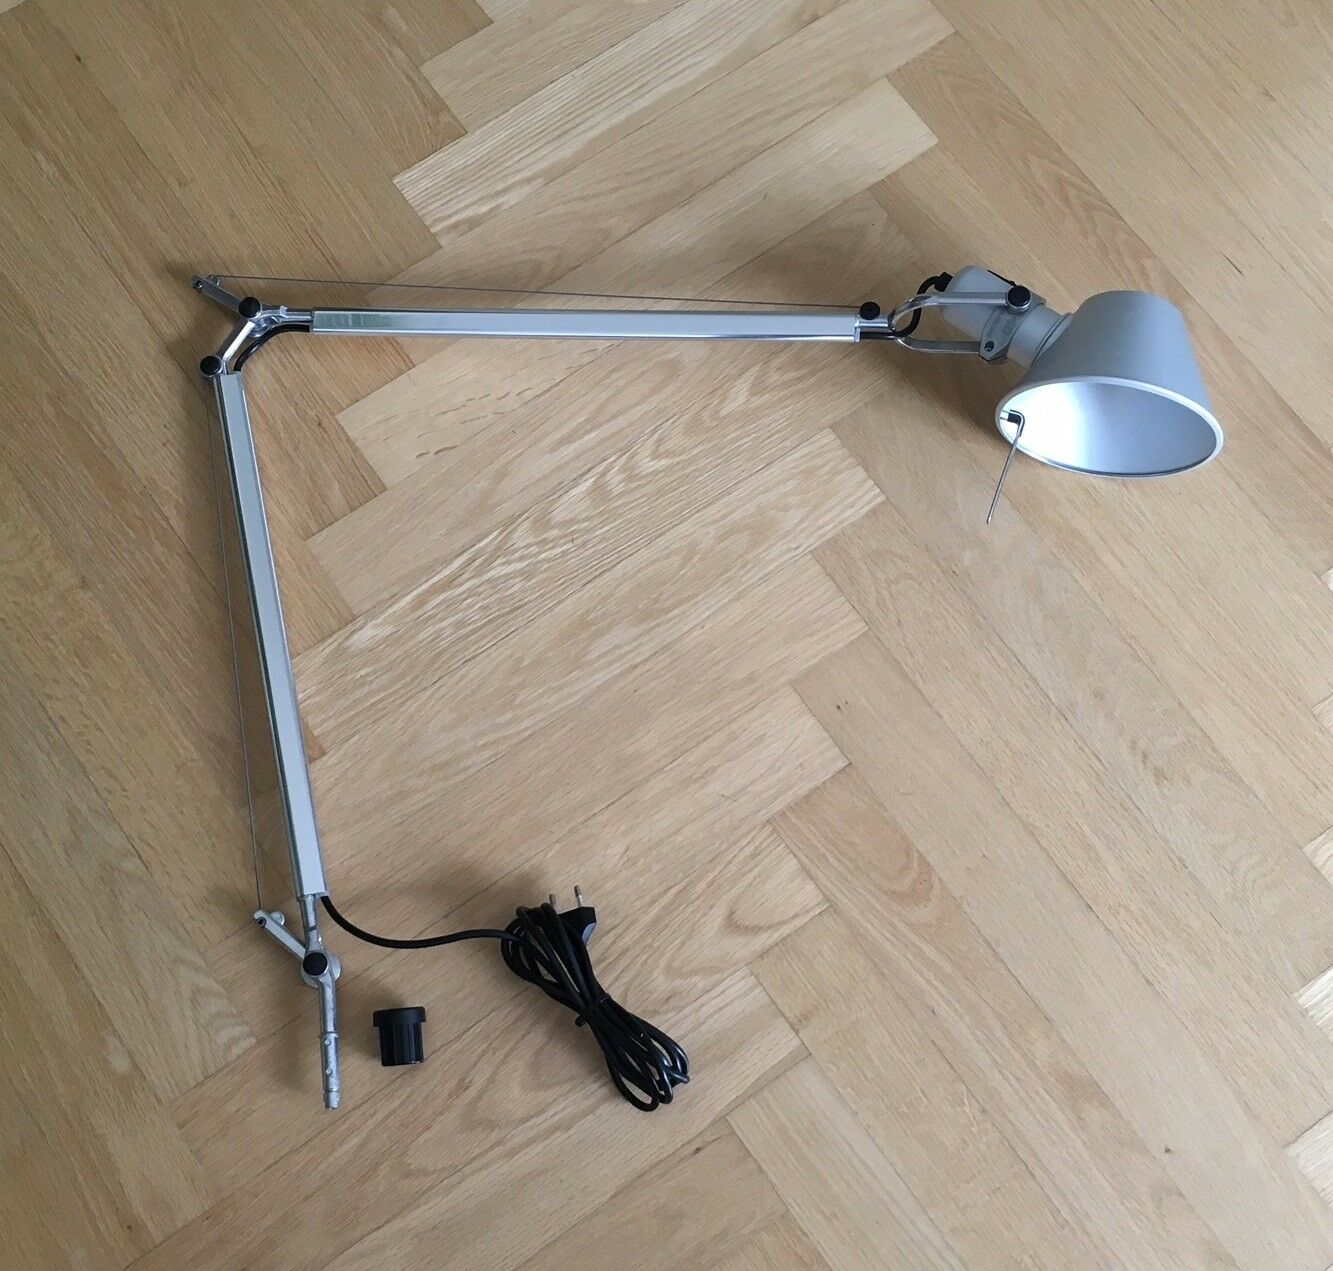 Artemide Tolomeo Lettura 230v Stehlampe Alu Matt A013900 A014900 Gunstig Kaufen Ebay